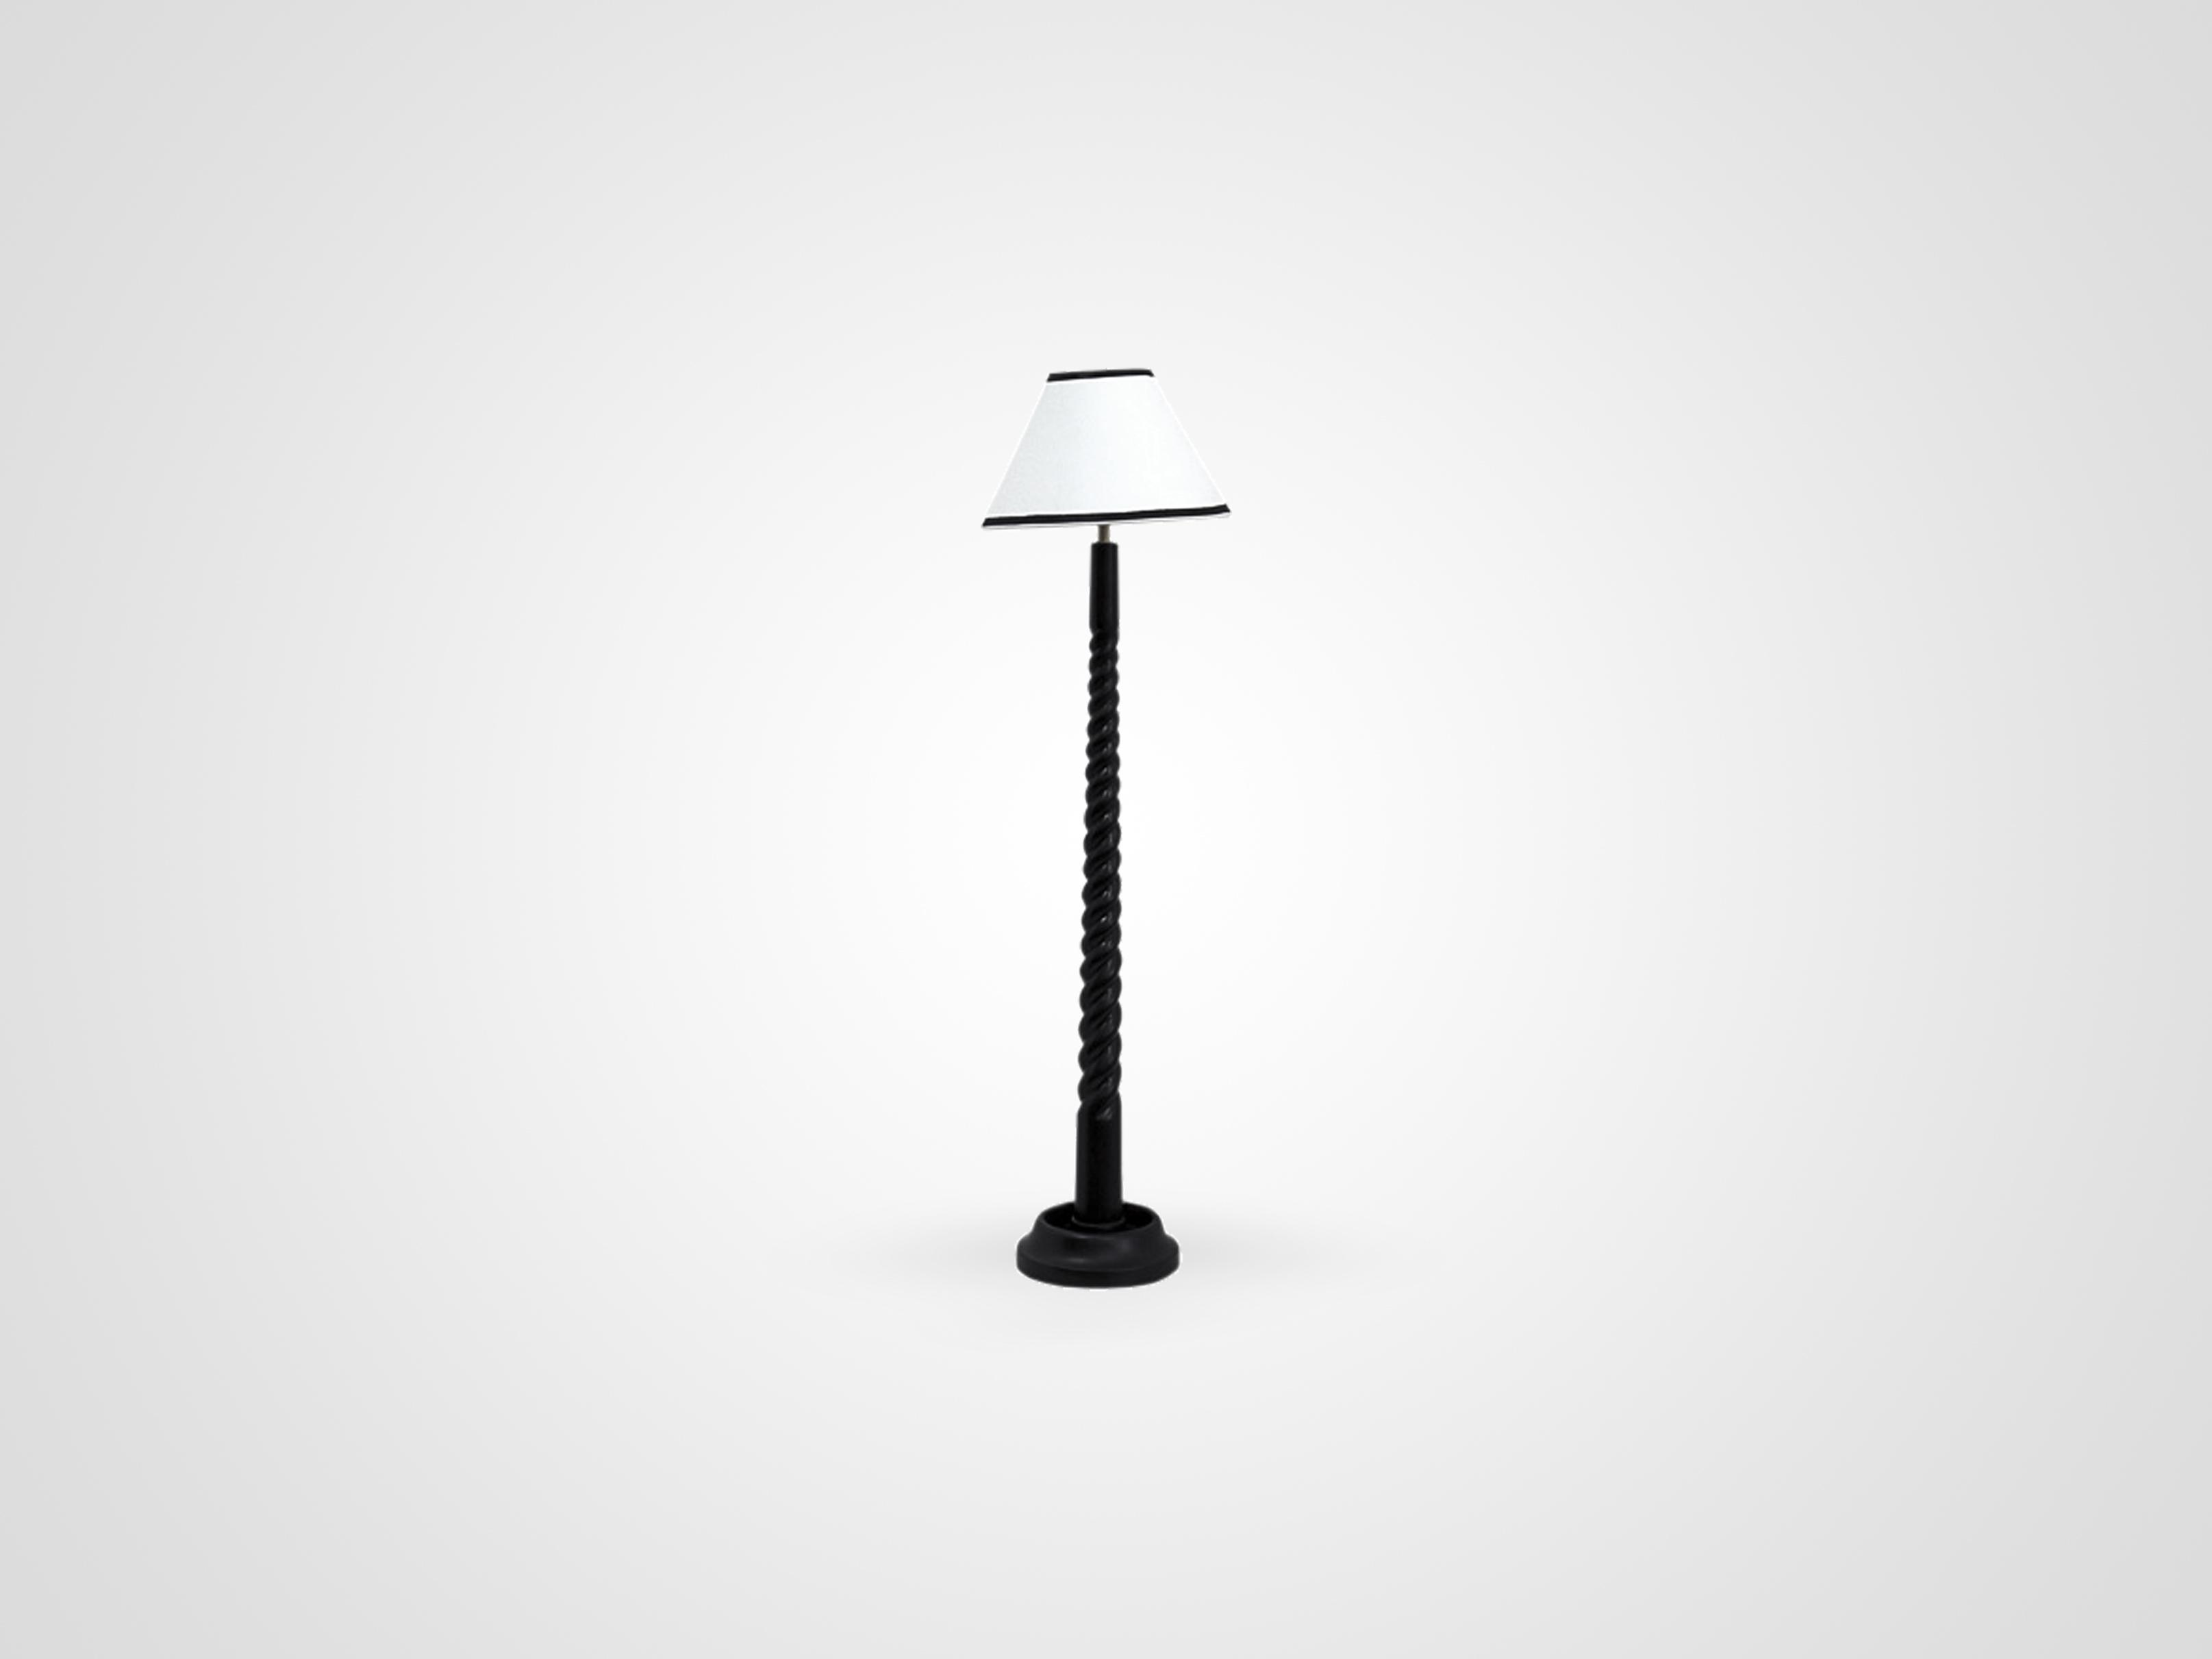 Настольная лампа с белым абажуром, inmyroom, Индонезия  - Купить